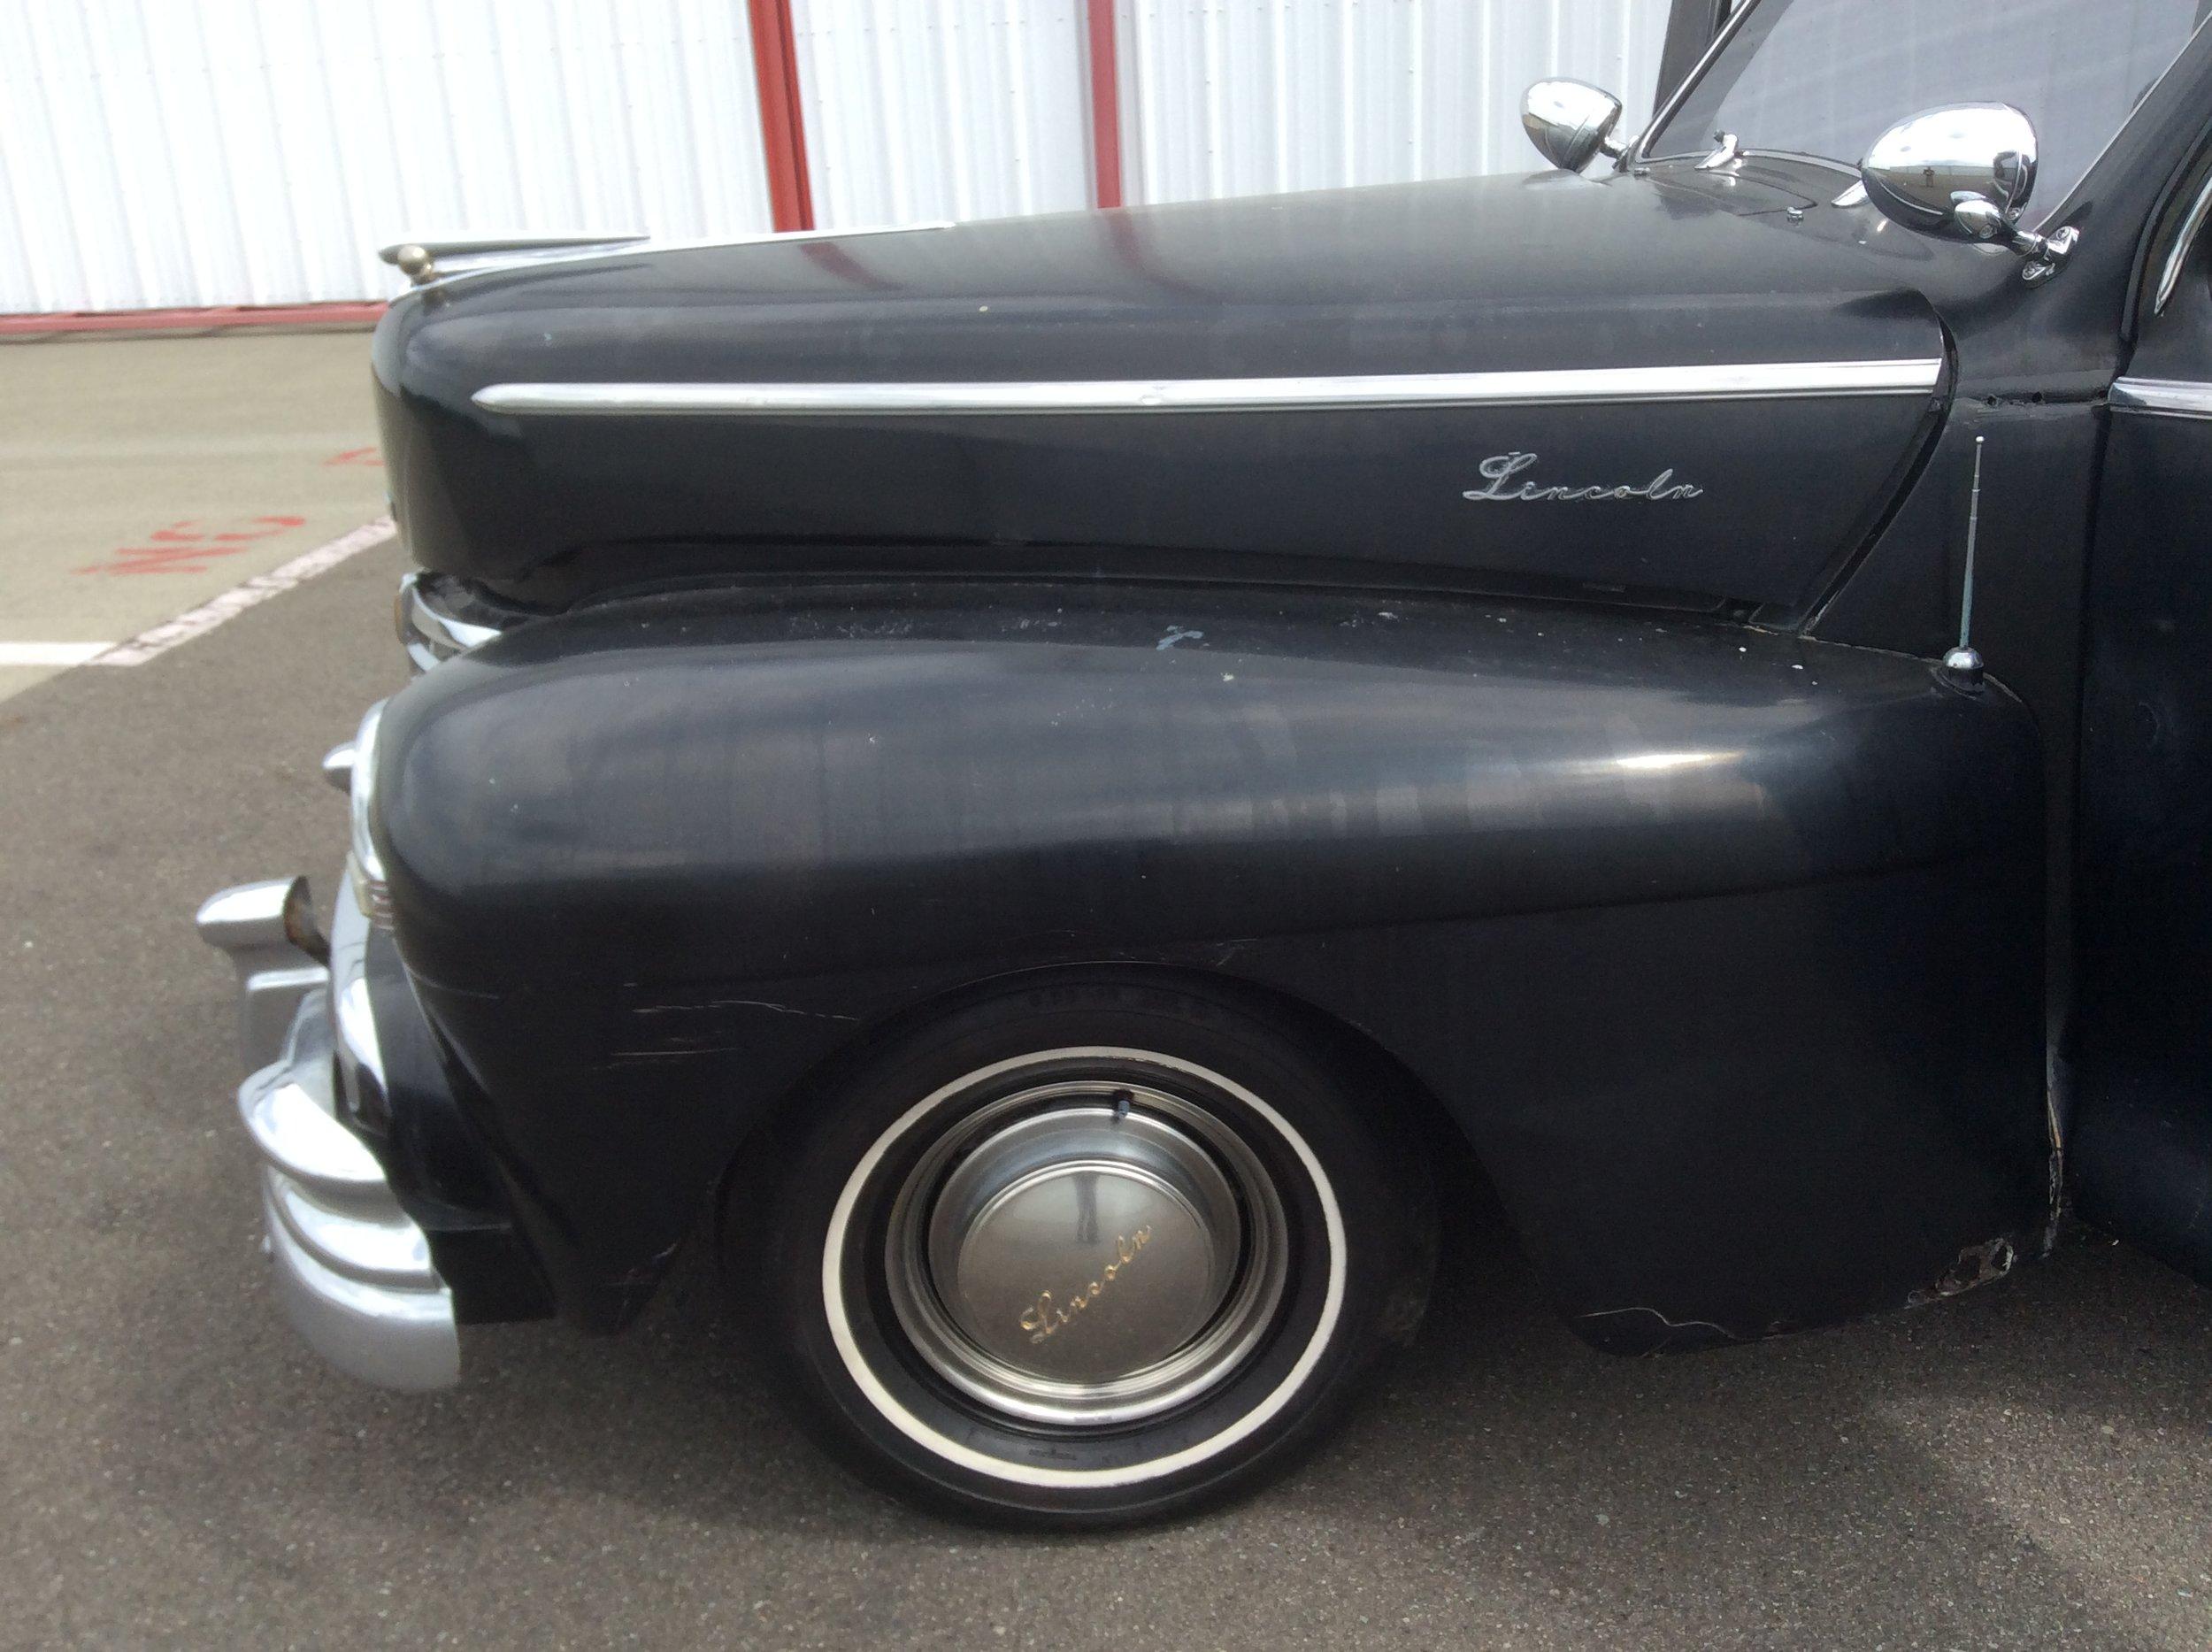 1948 Lincoln Zephyr (136).JPG